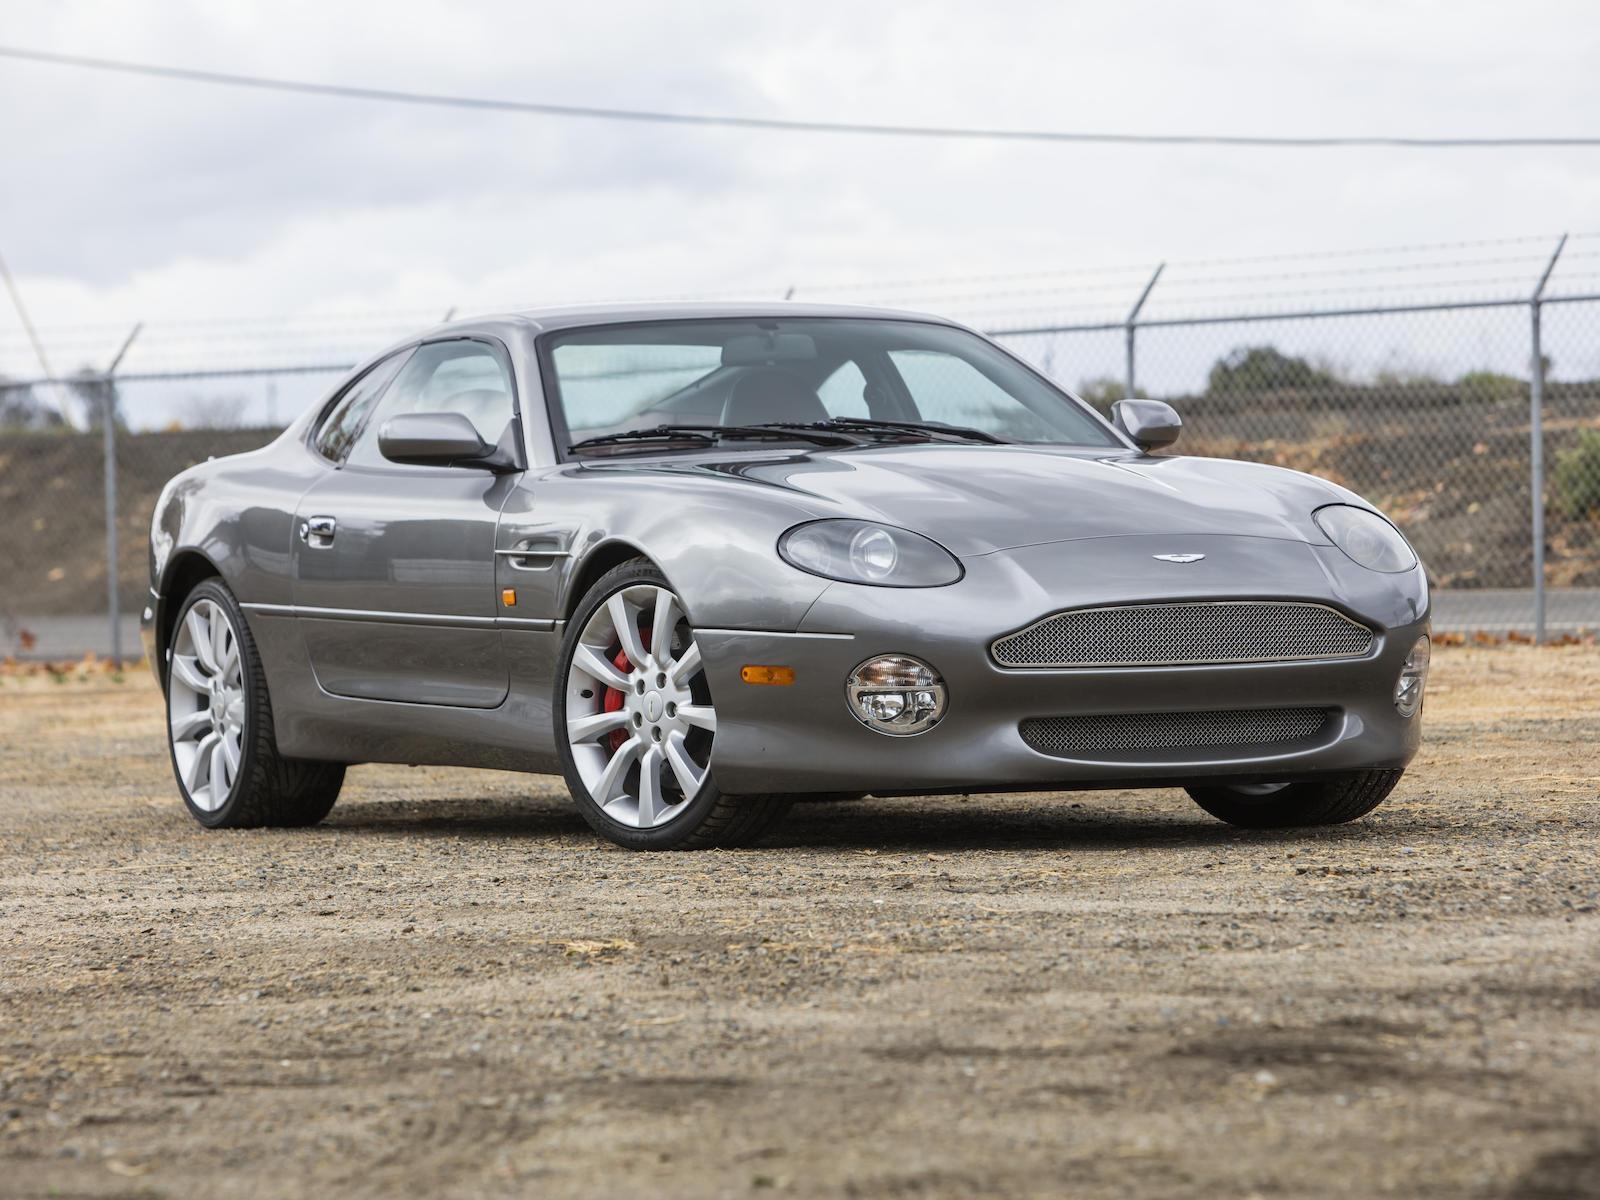 2003 Aston Martin DB7 Vantage Coupe